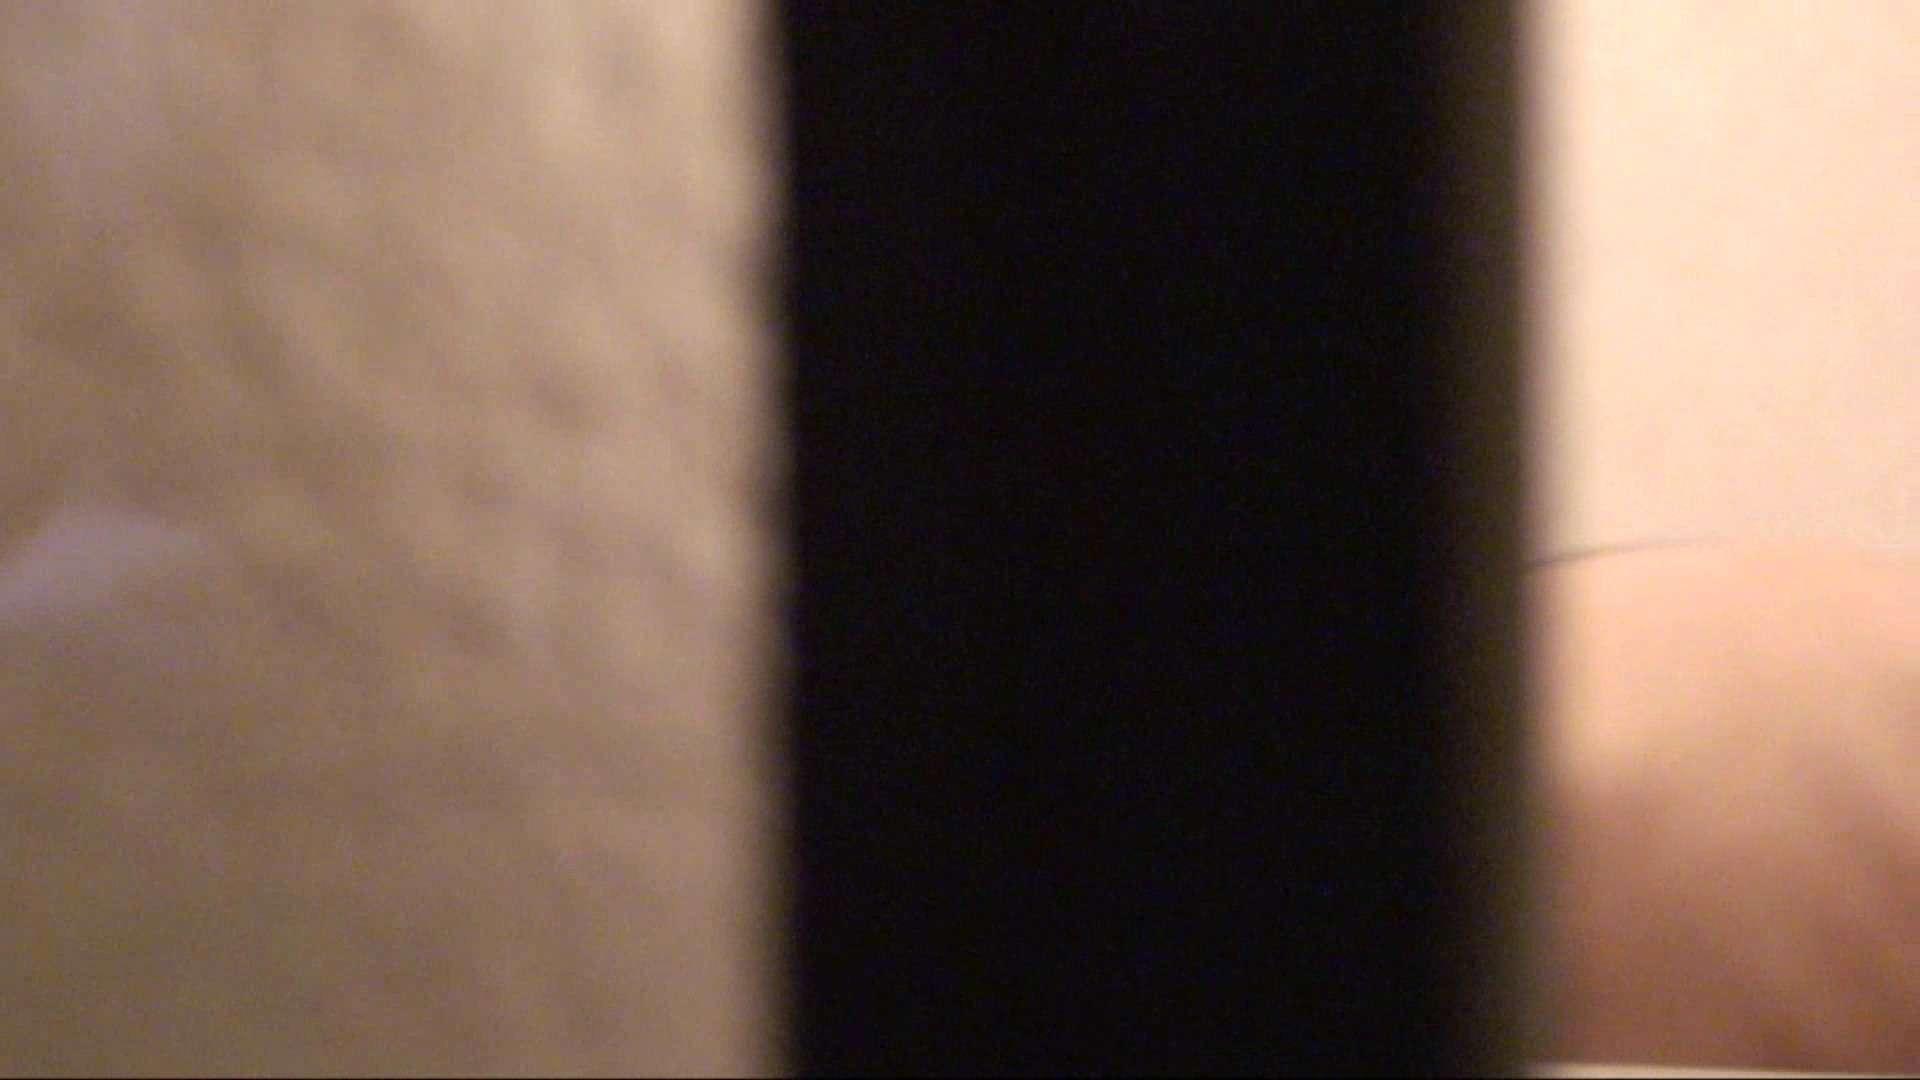 vol.01必見!白肌嬢の乳首が丸見え。極上美人のすっぴん顔をハイビジョンで! 丸見え おめこ無修正動画無料 71画像 48